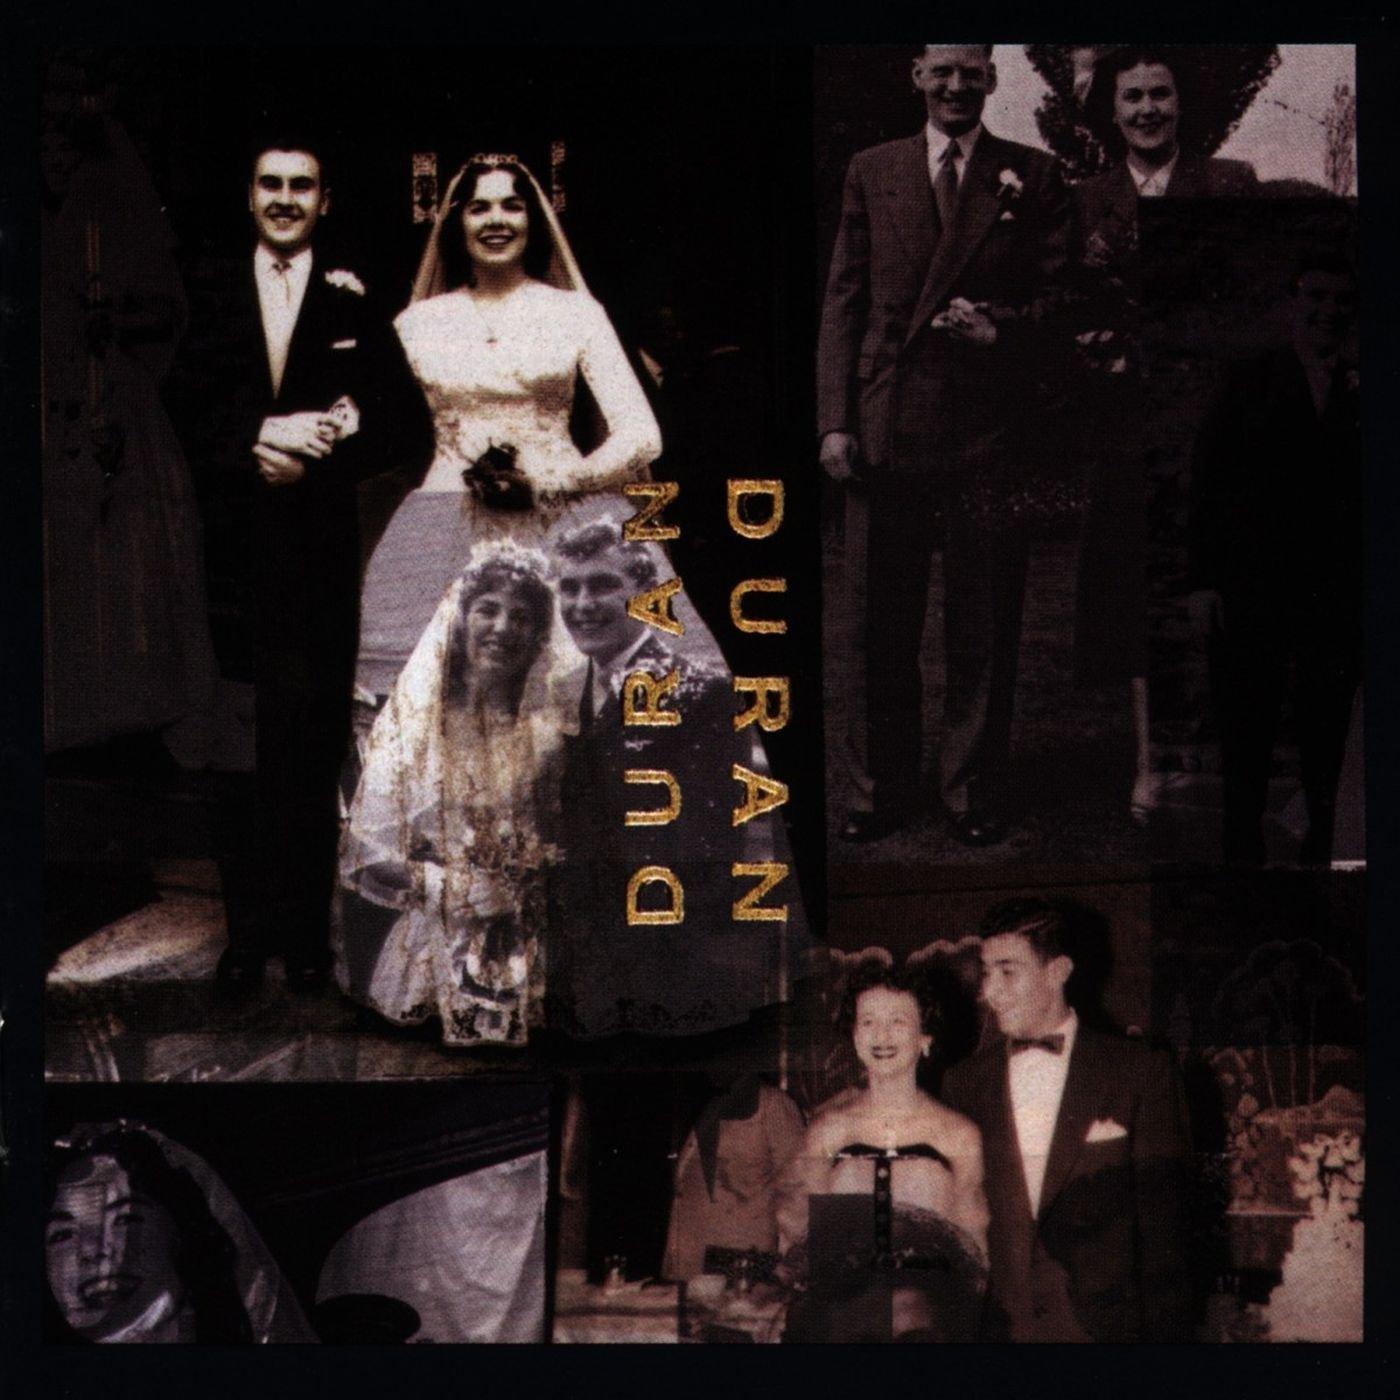 download duran duran ordinary world mp3 free